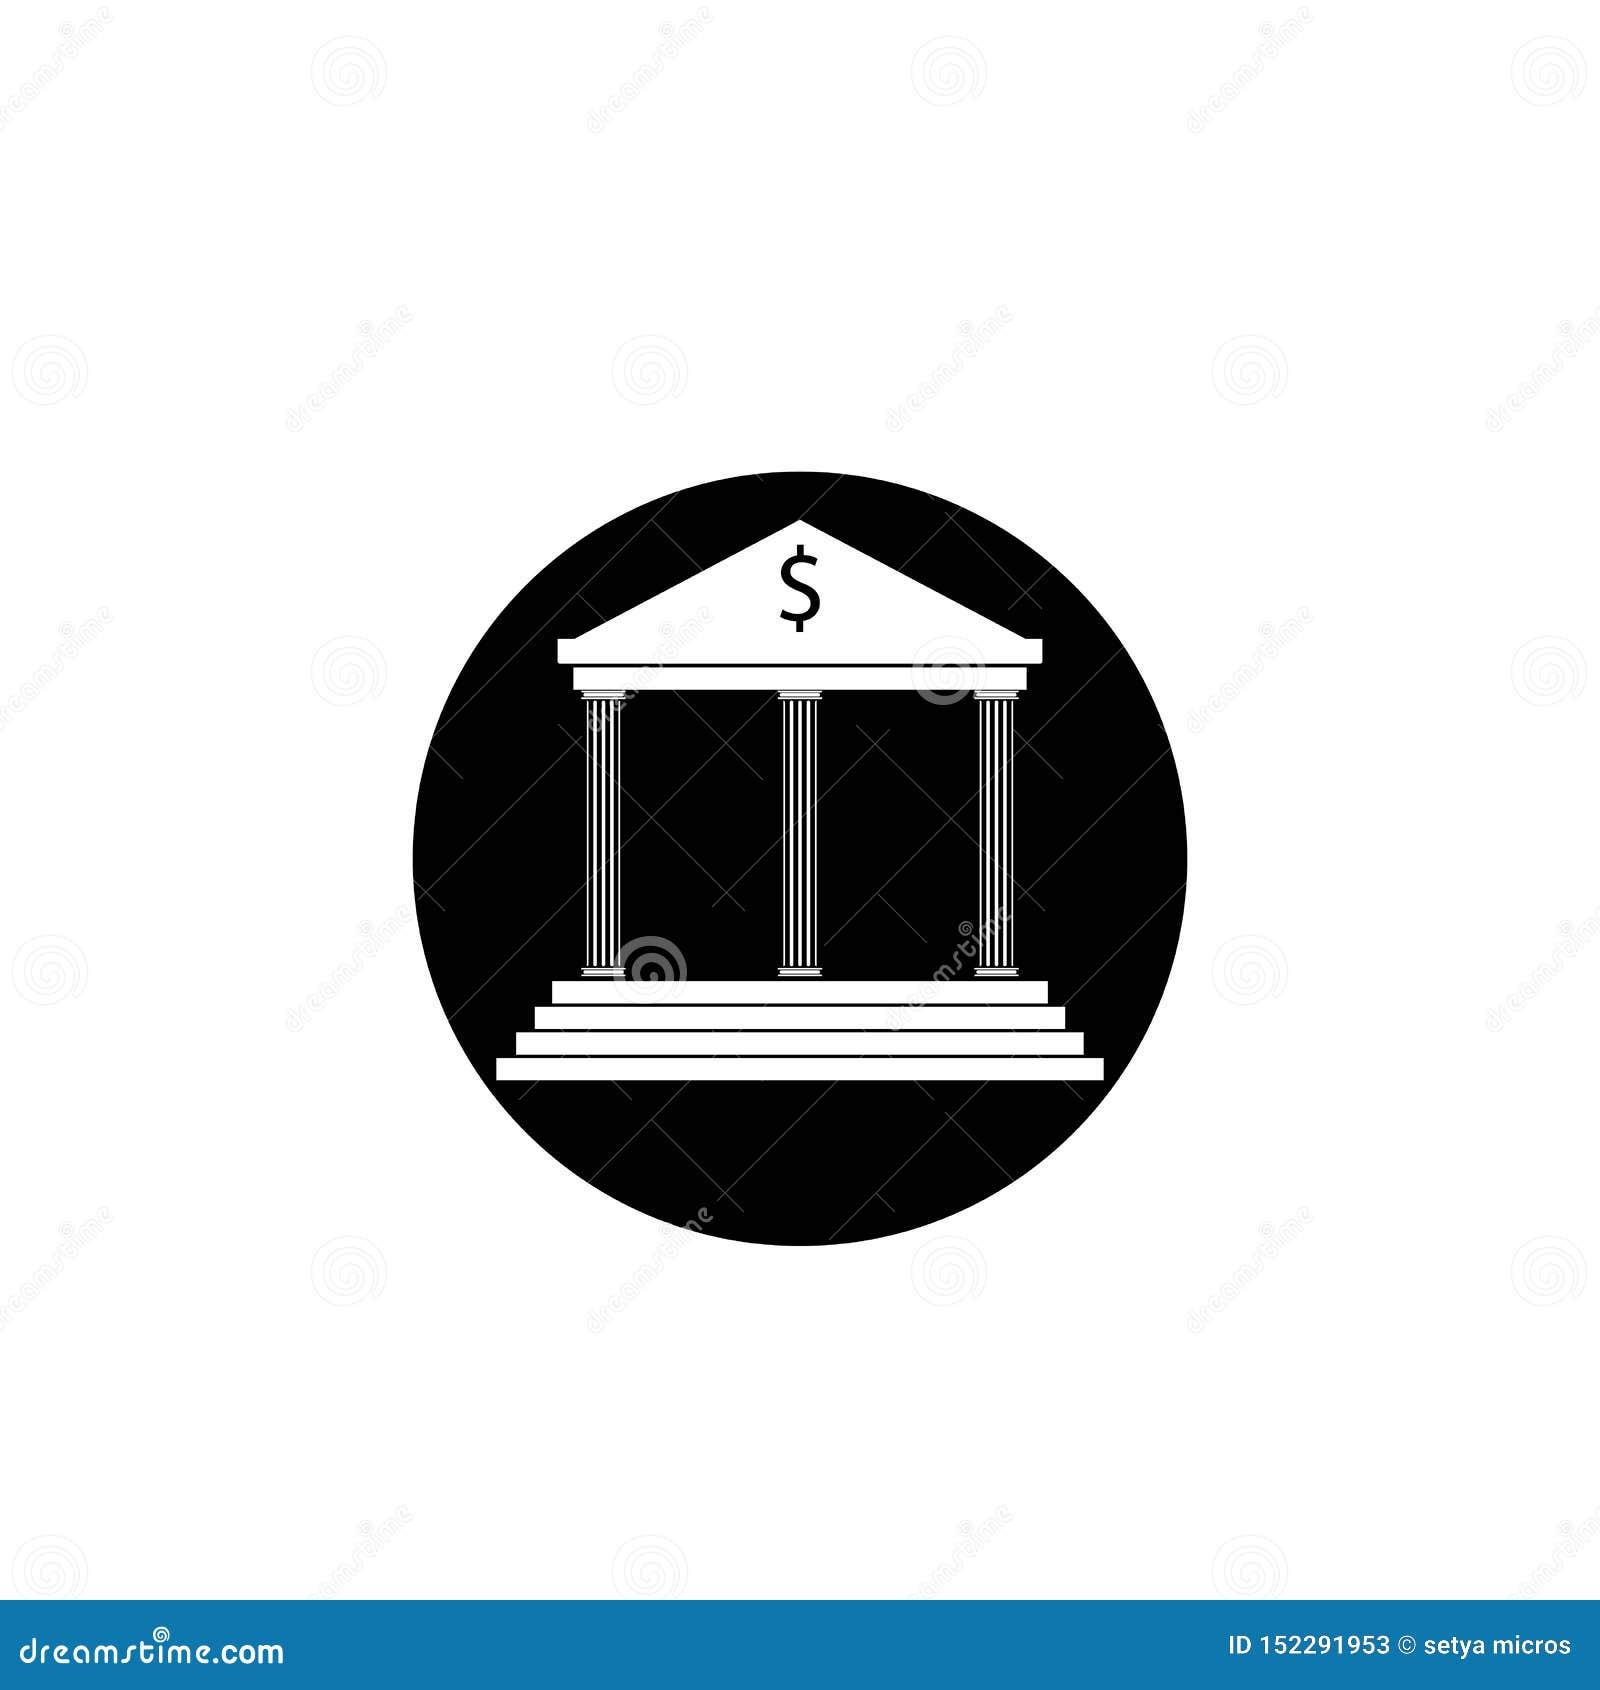 шаблон логотипа вектора значка банка